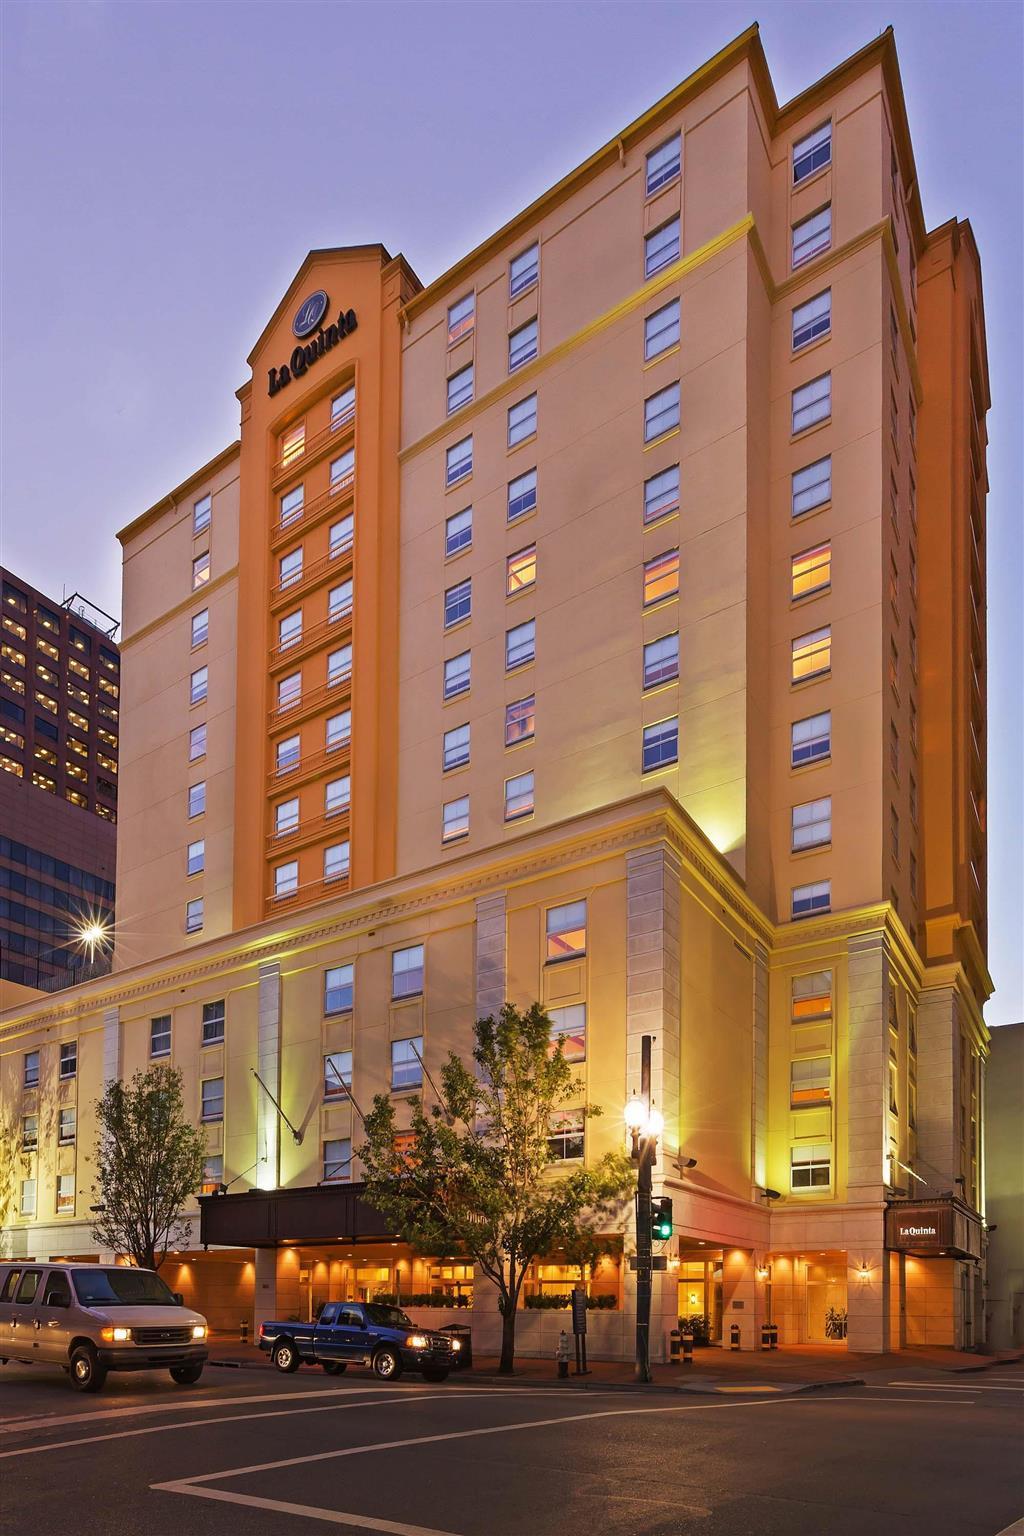 La Quinta Inn & Suites New Orleans Downtown - UPDATED 2017 ...